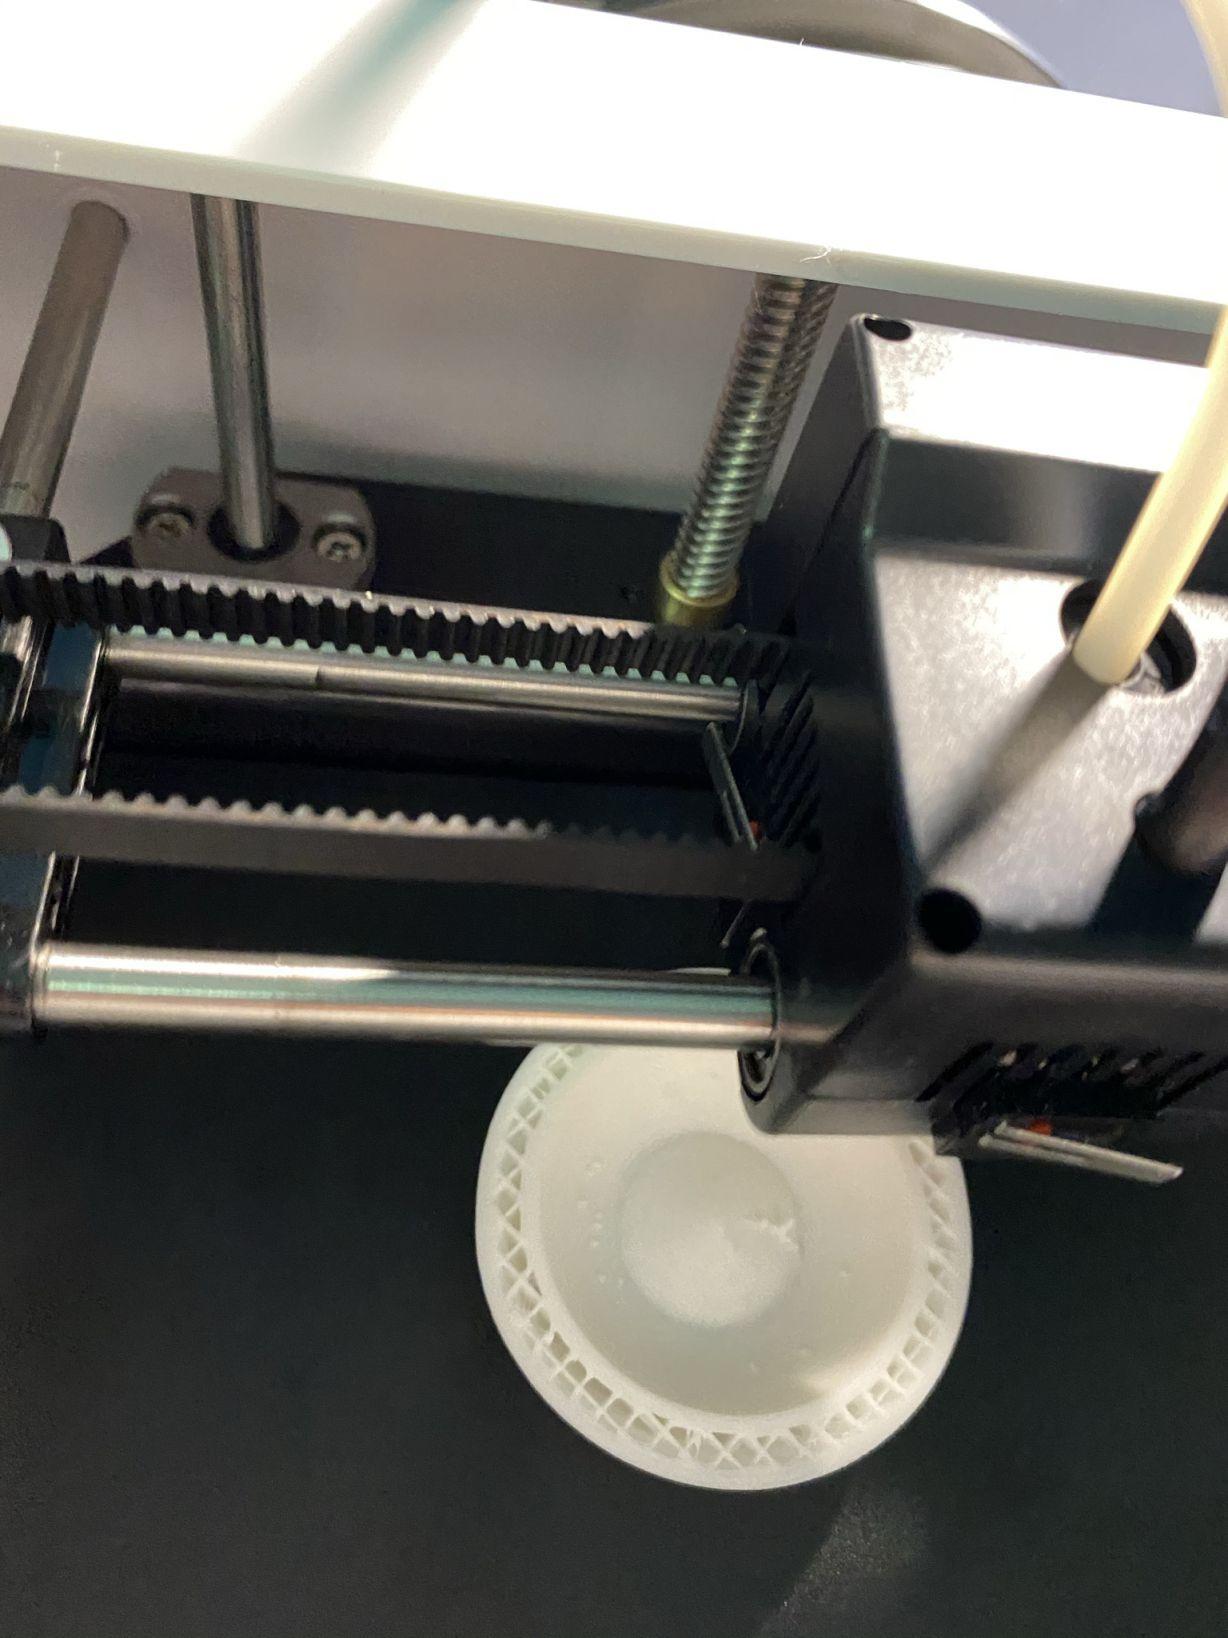 recensione-stampante-3d-flucrum-minibot-38 Recensione FULCRUM MINIBOT, Stampante 3D Facile e Veloce